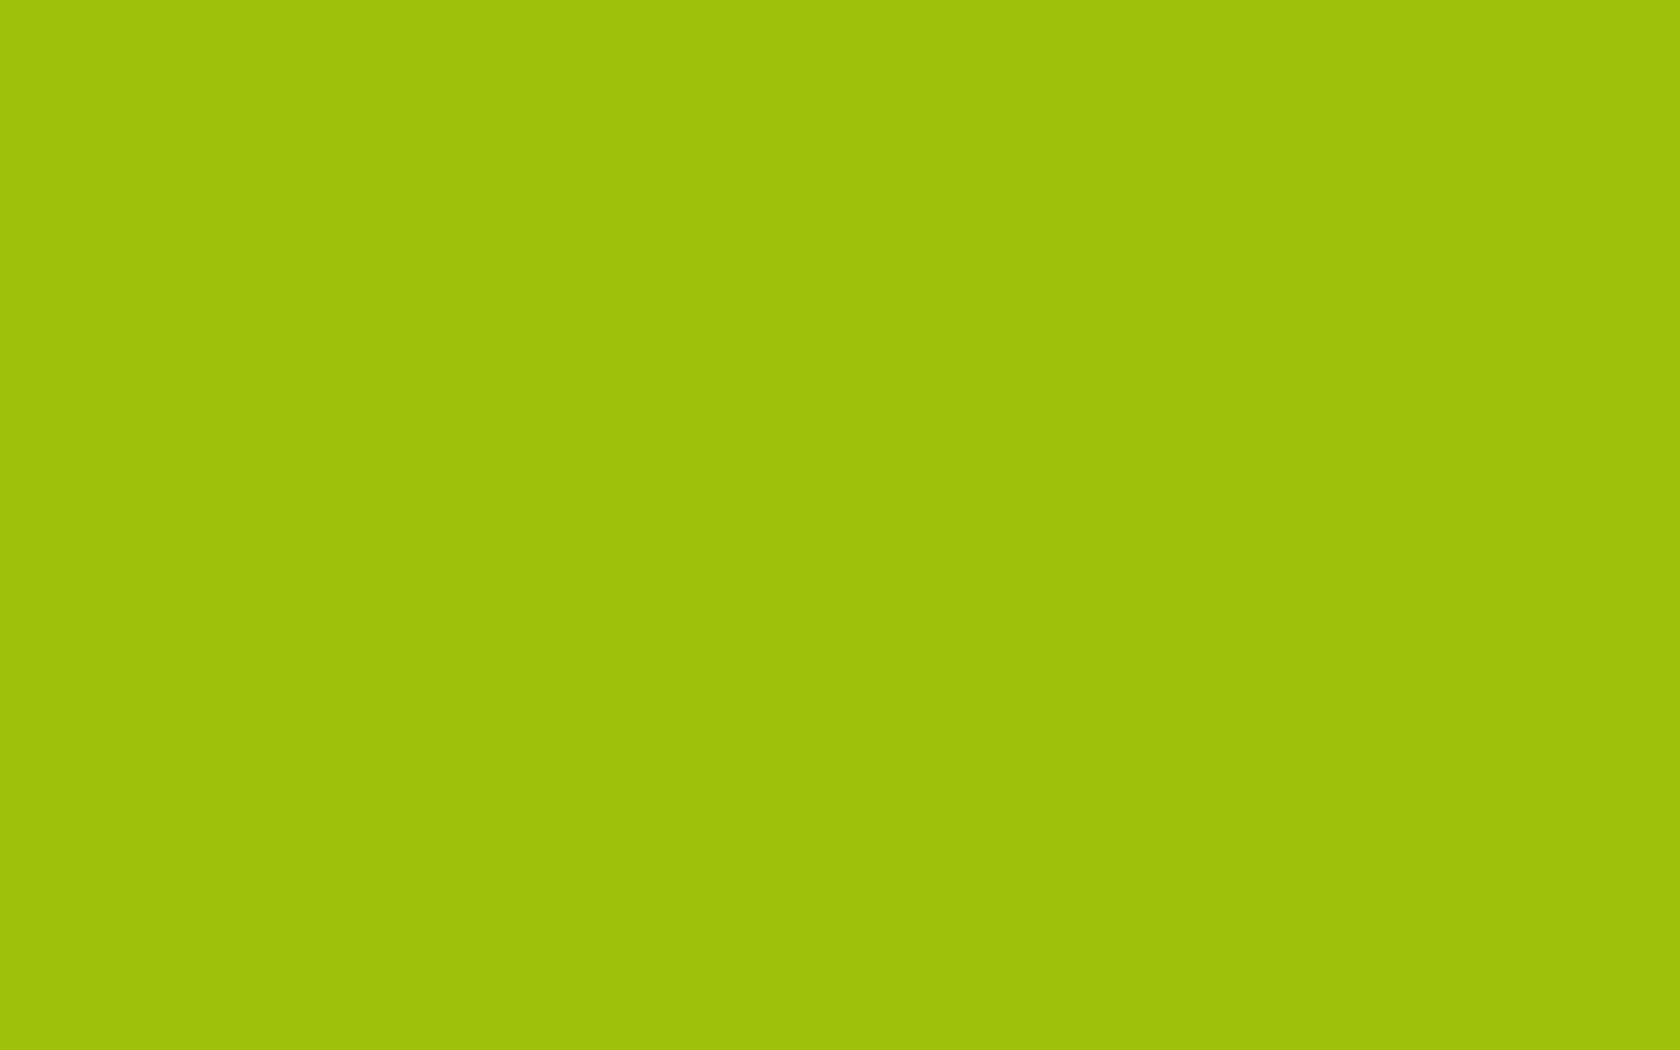 1680x1050 Limerick Solid Color Background